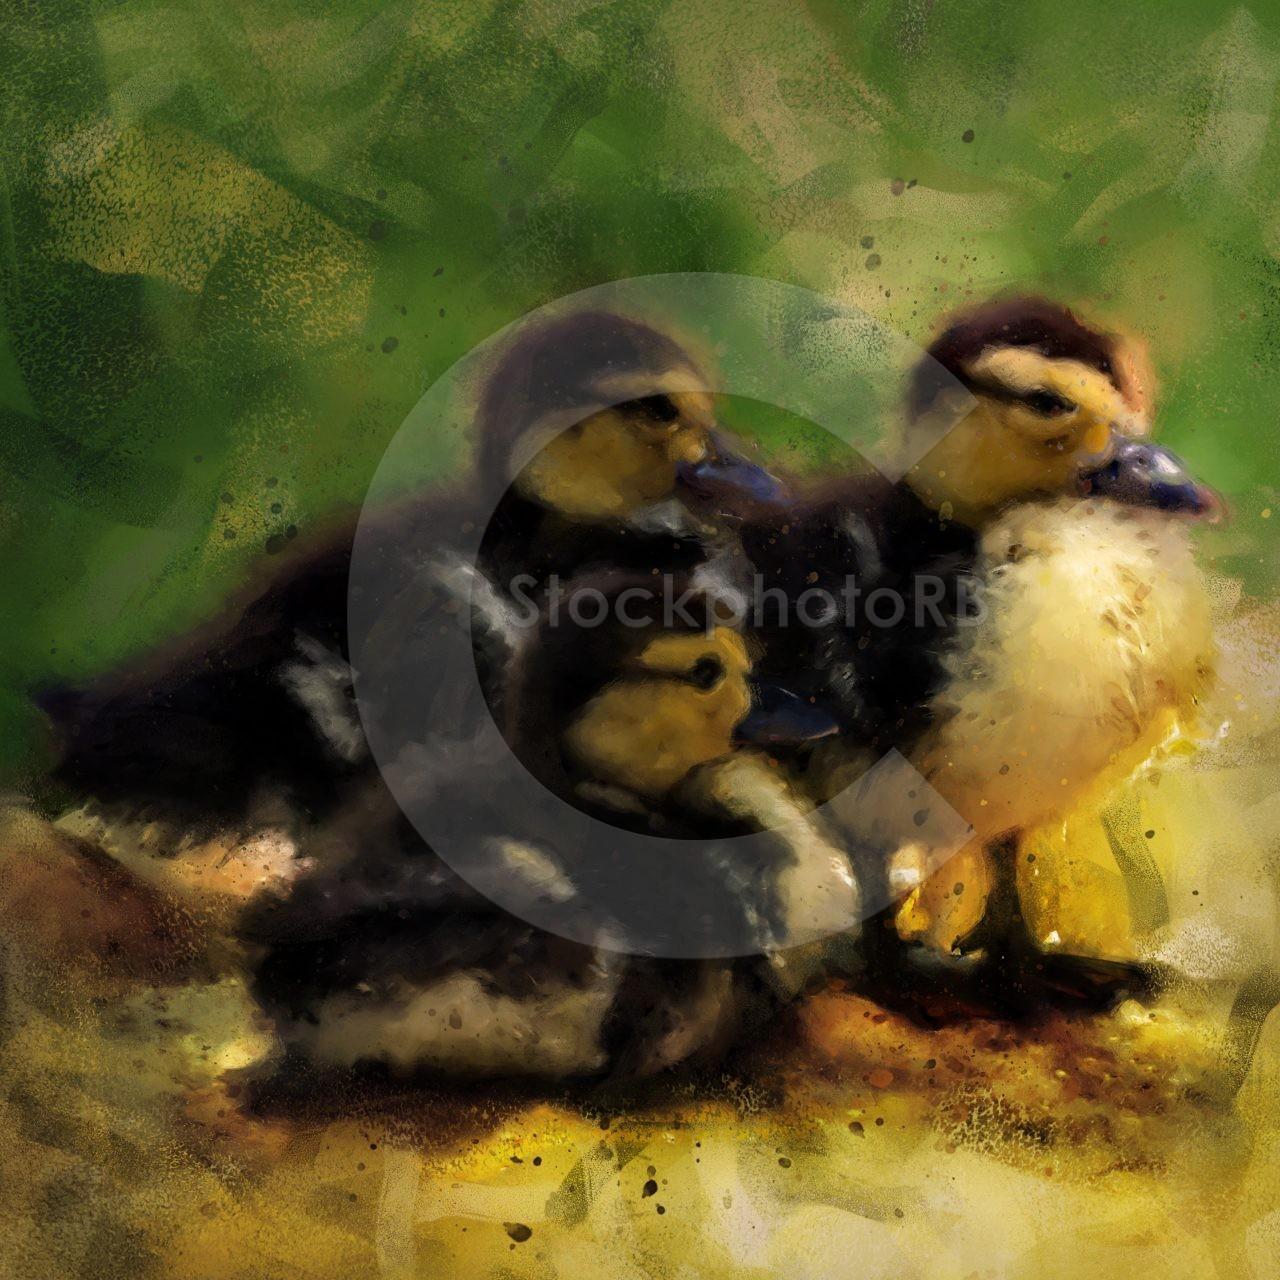 Three little ducklings